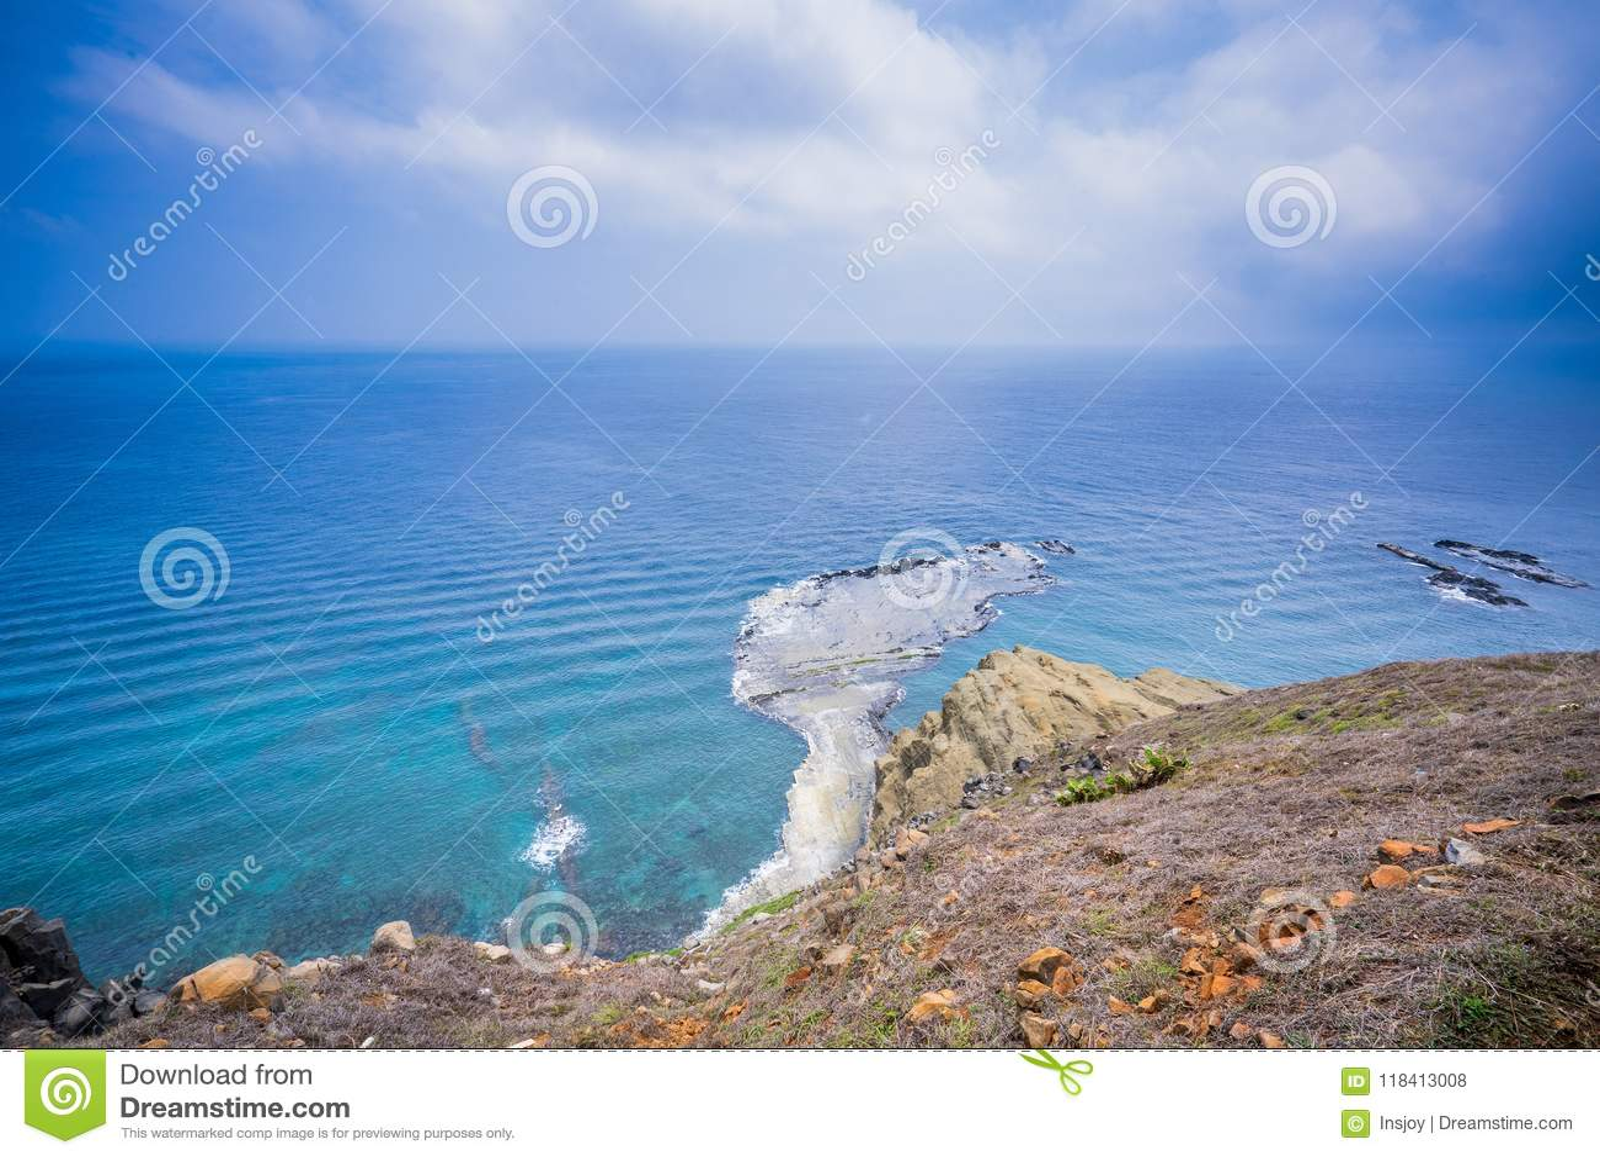 Chi-mei Island is Offshore Islands of Taiwan in penghu. There is a scenery `little Taiwan`